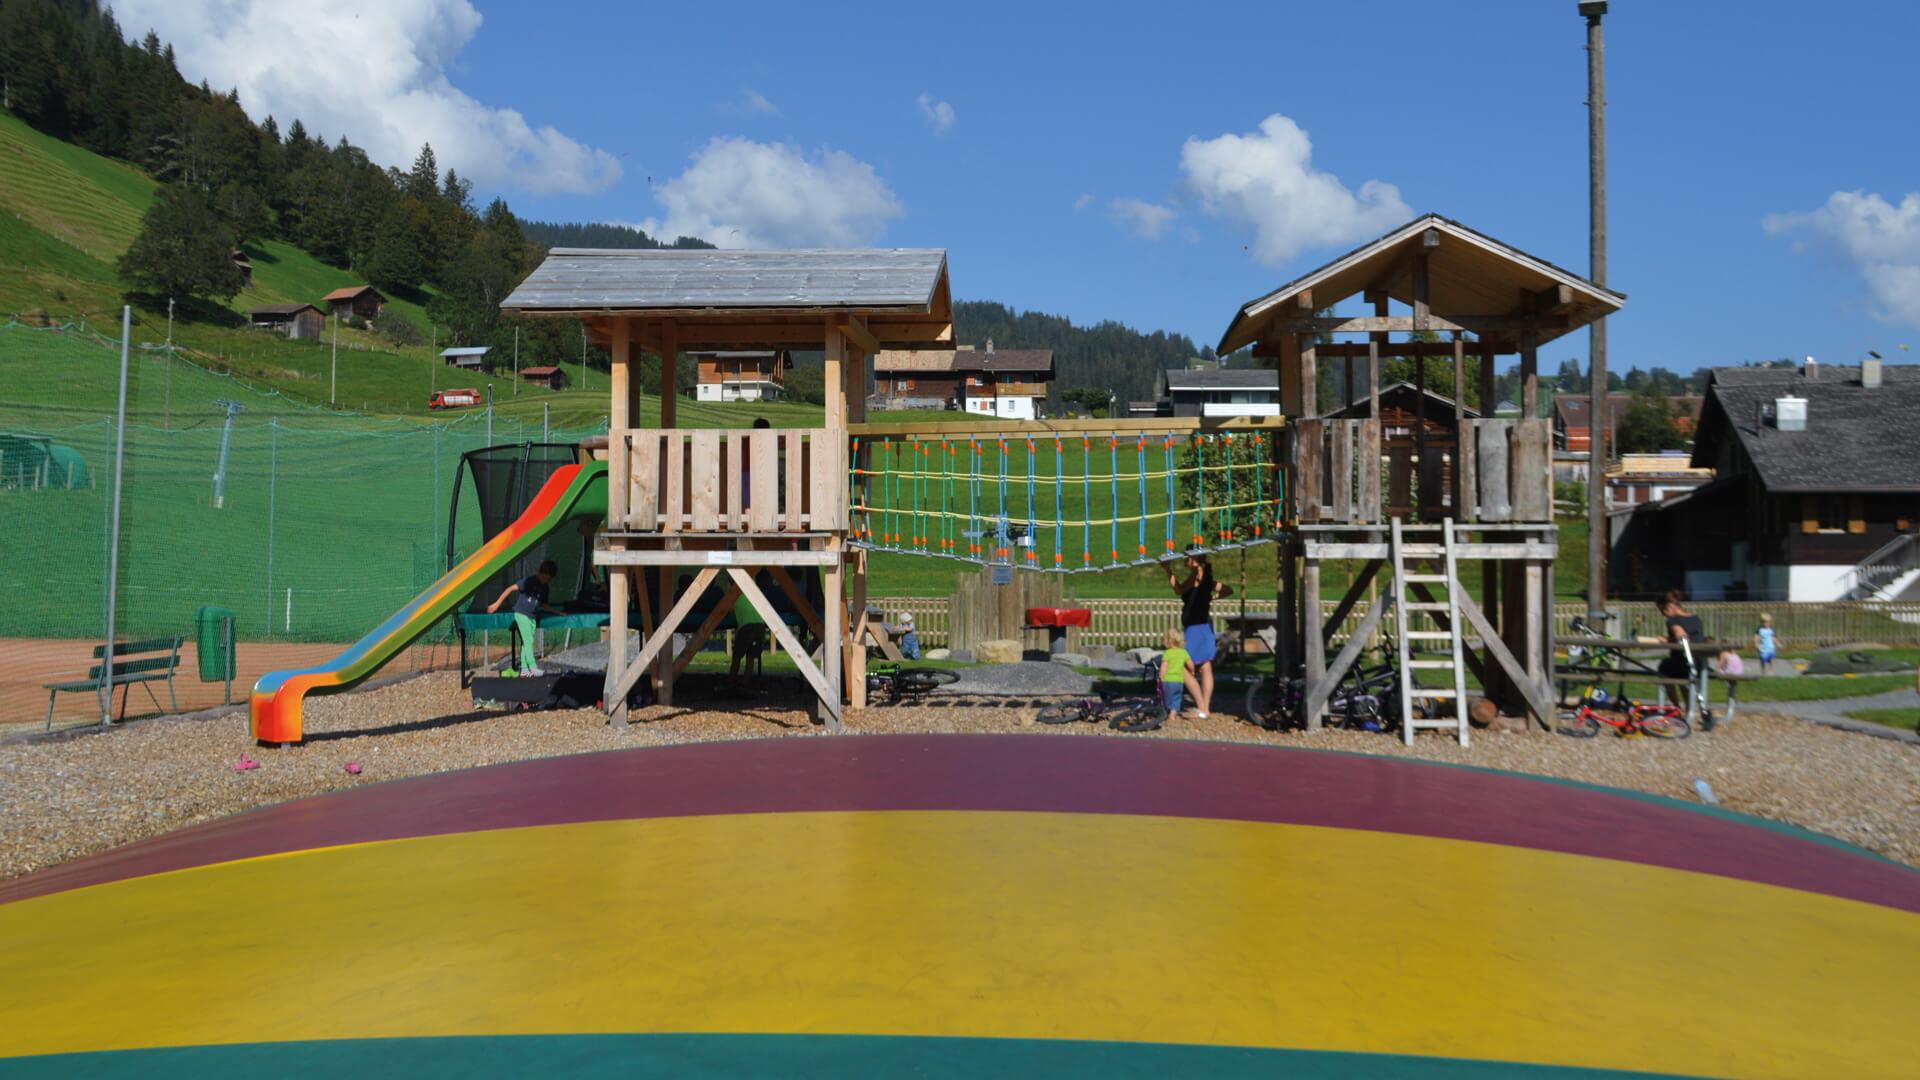 beatenberg-spielplatz-spielturm